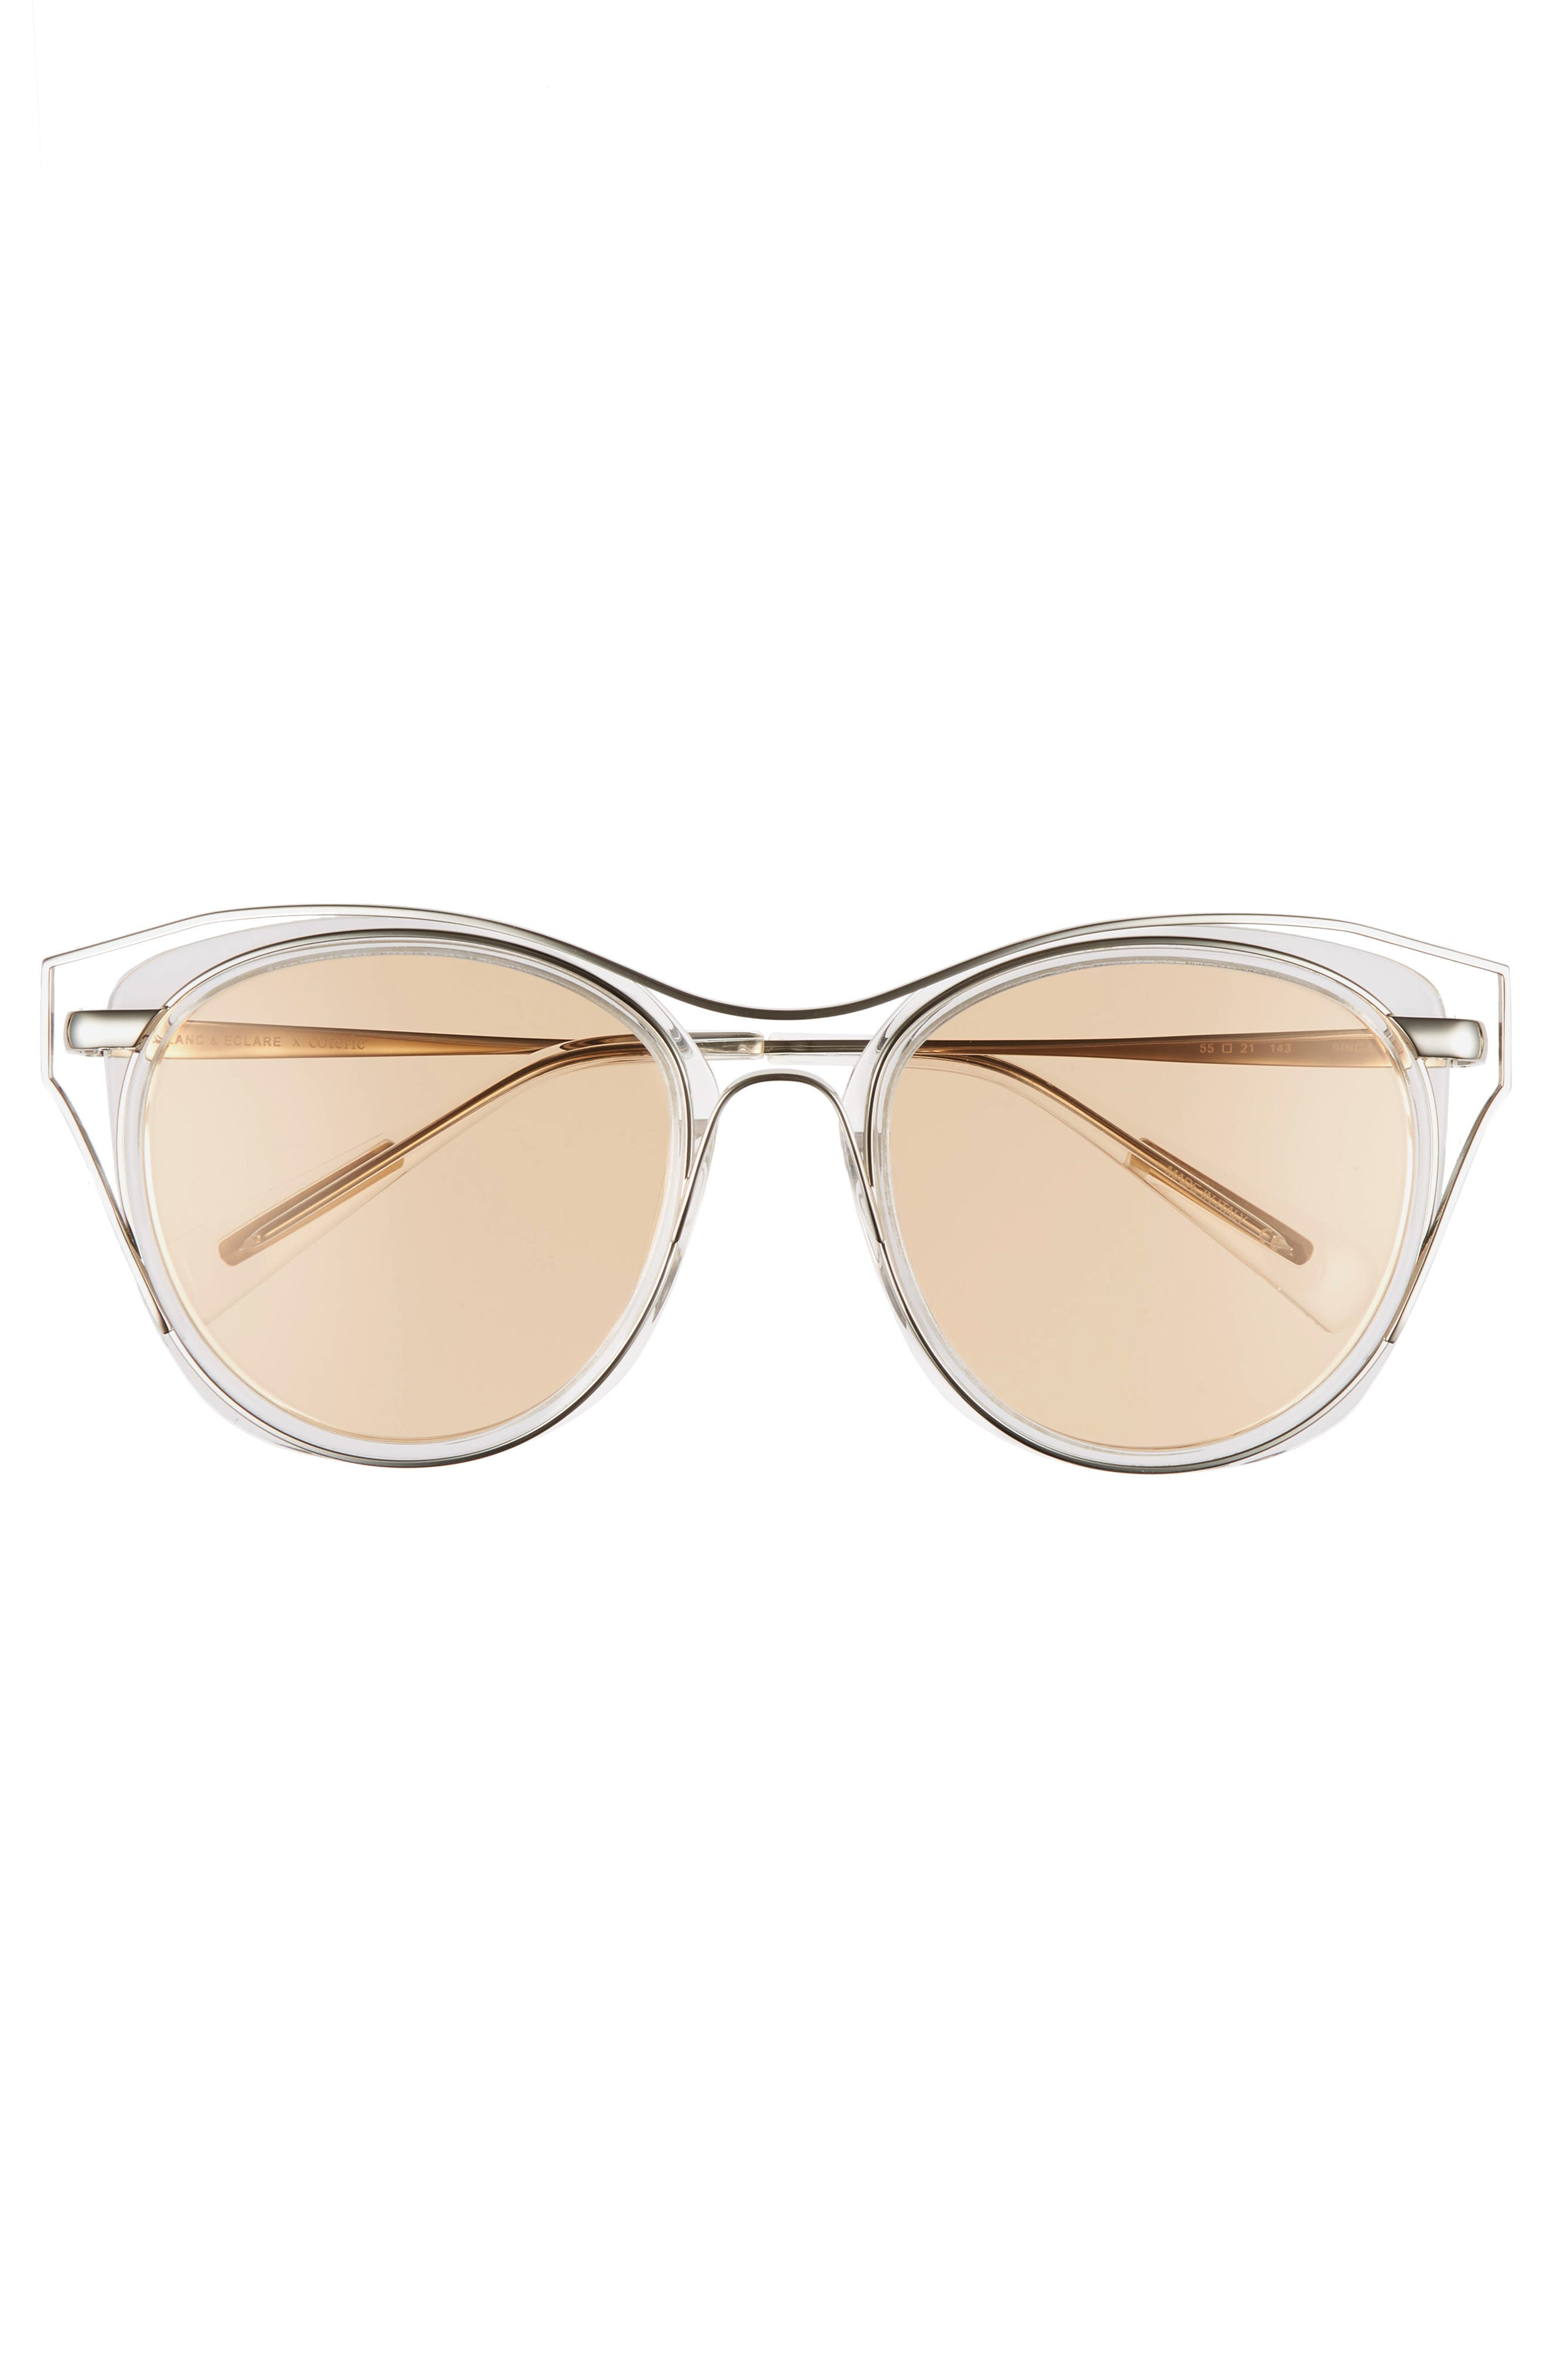 BLANC & ECLARE Singapore 55mm Polarized Sunglasses,                             Alternate thumbnail 3, color,                             Transparent/ Slv/ Orange